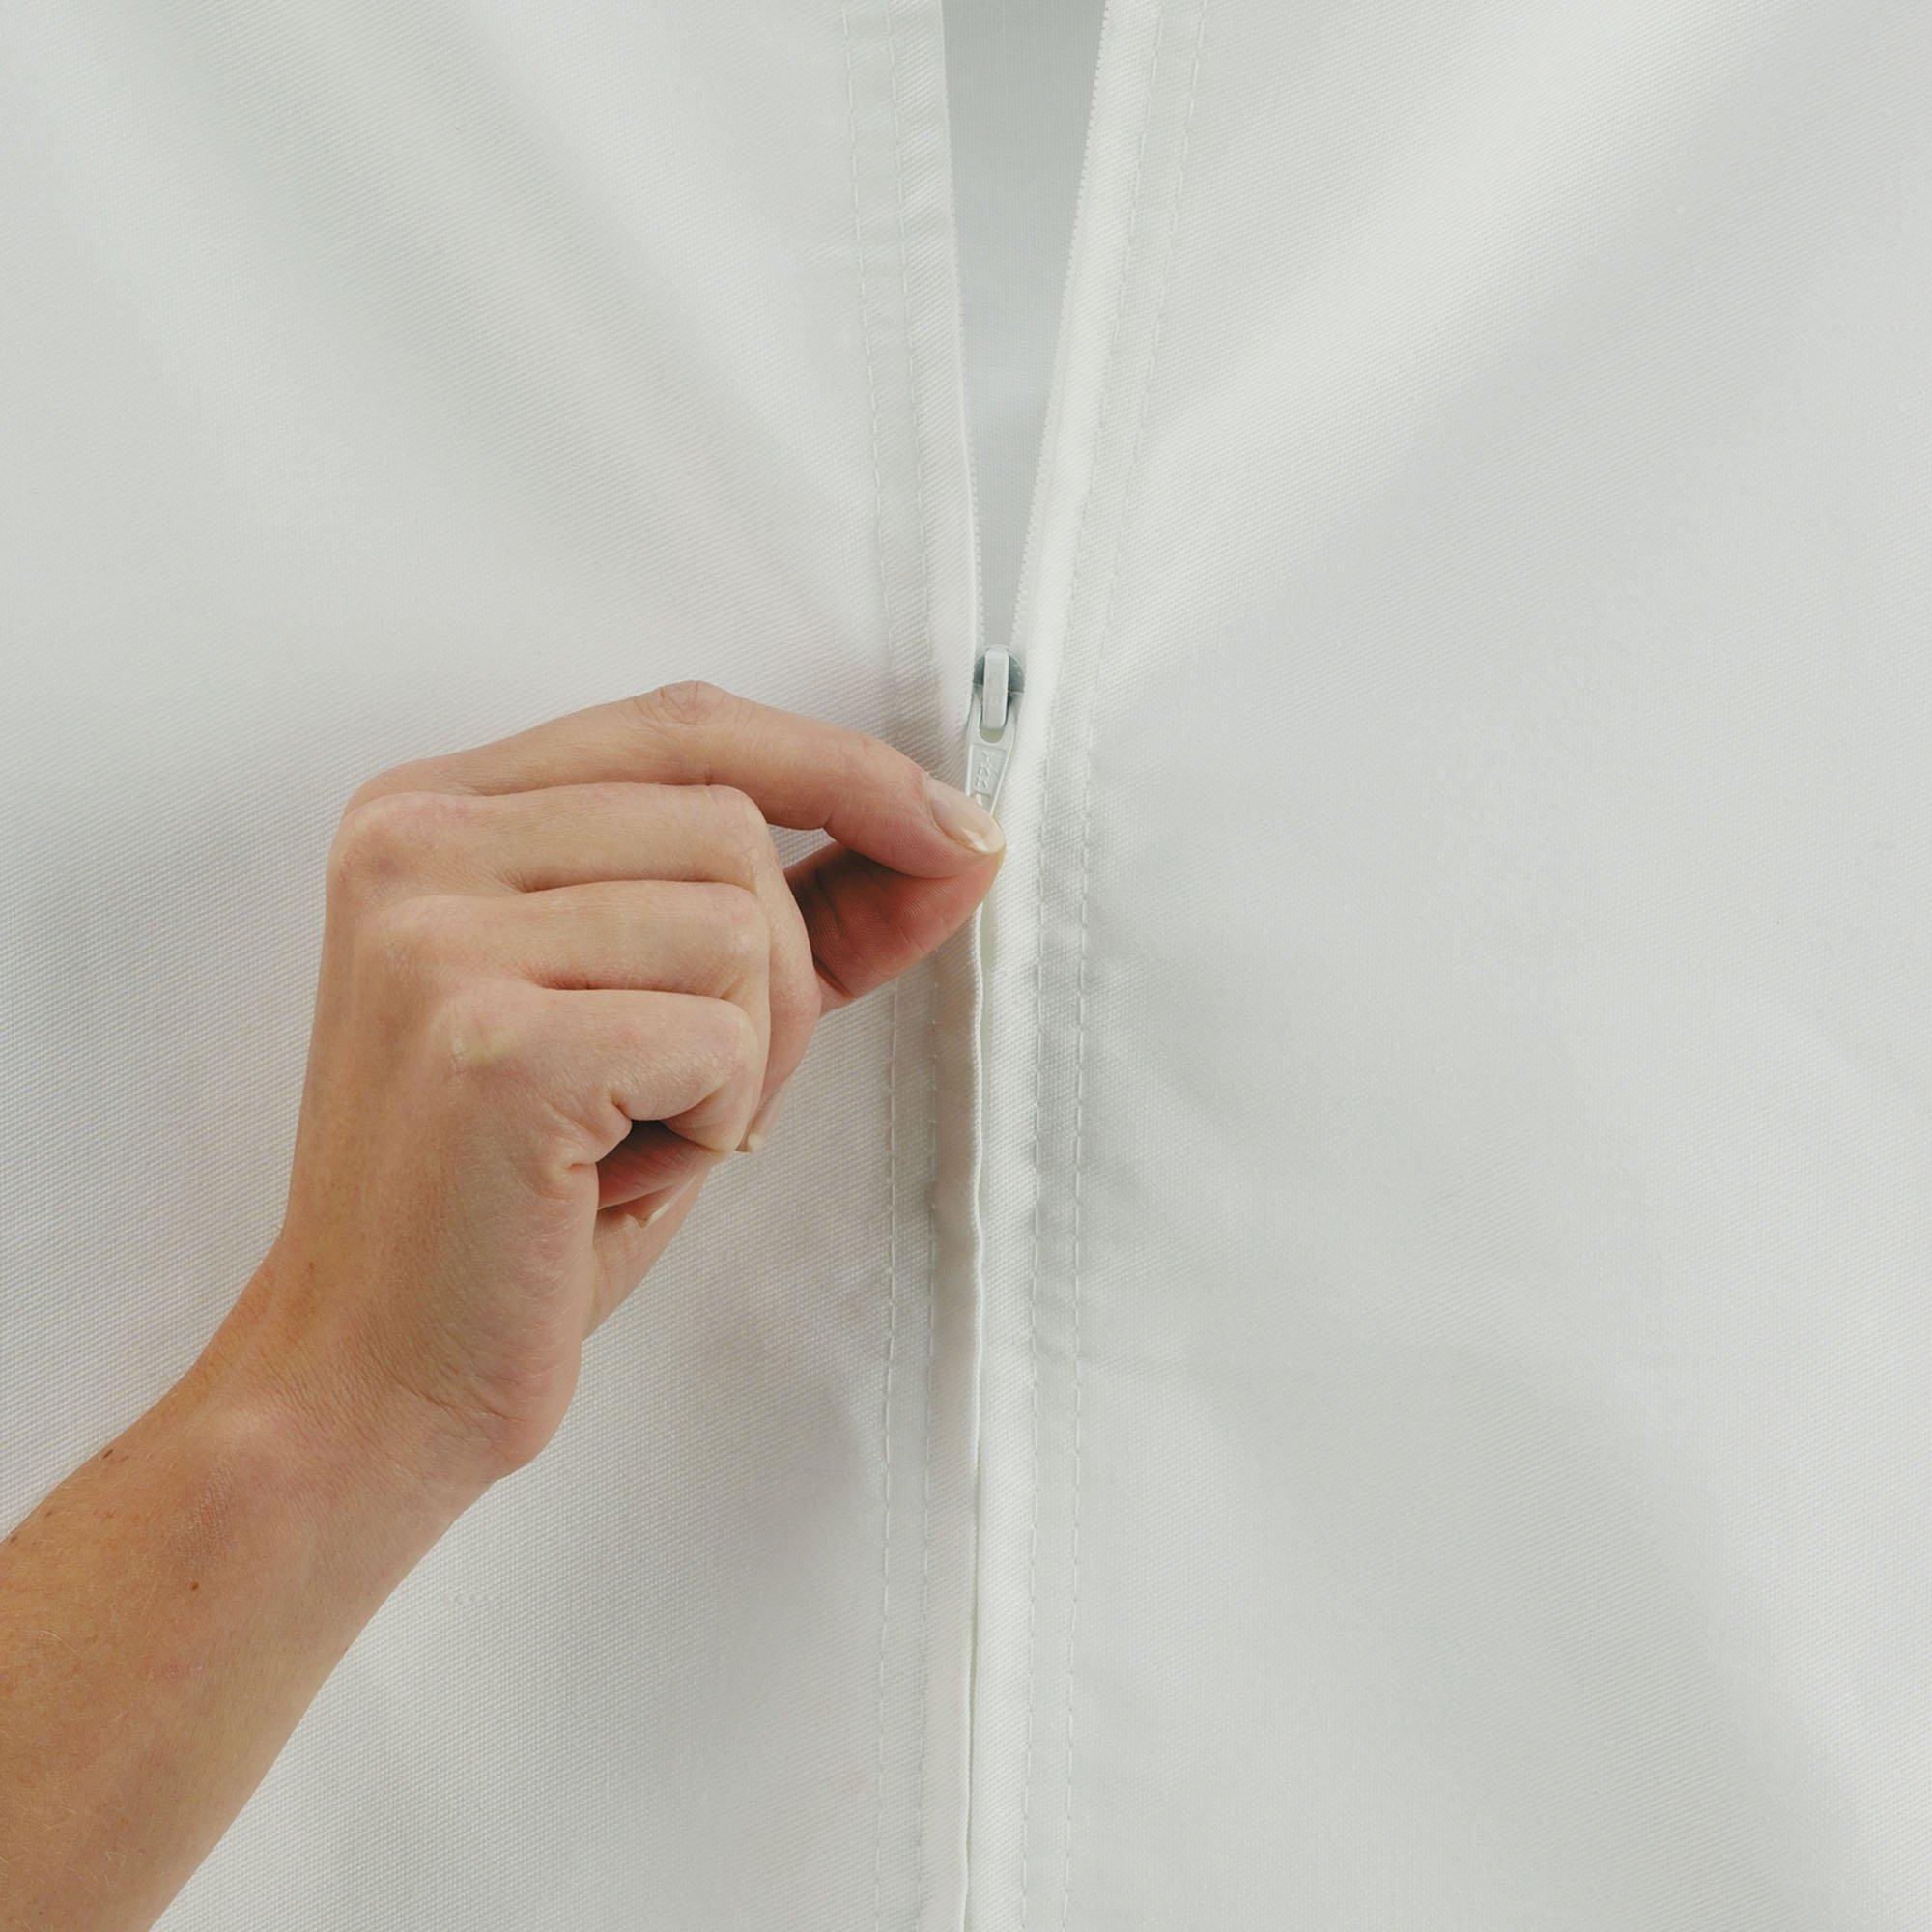 Household Essentials 148 Hanging Cotton Canvas Laundry Hamper Bag | White by Household Essentials (Image #6)